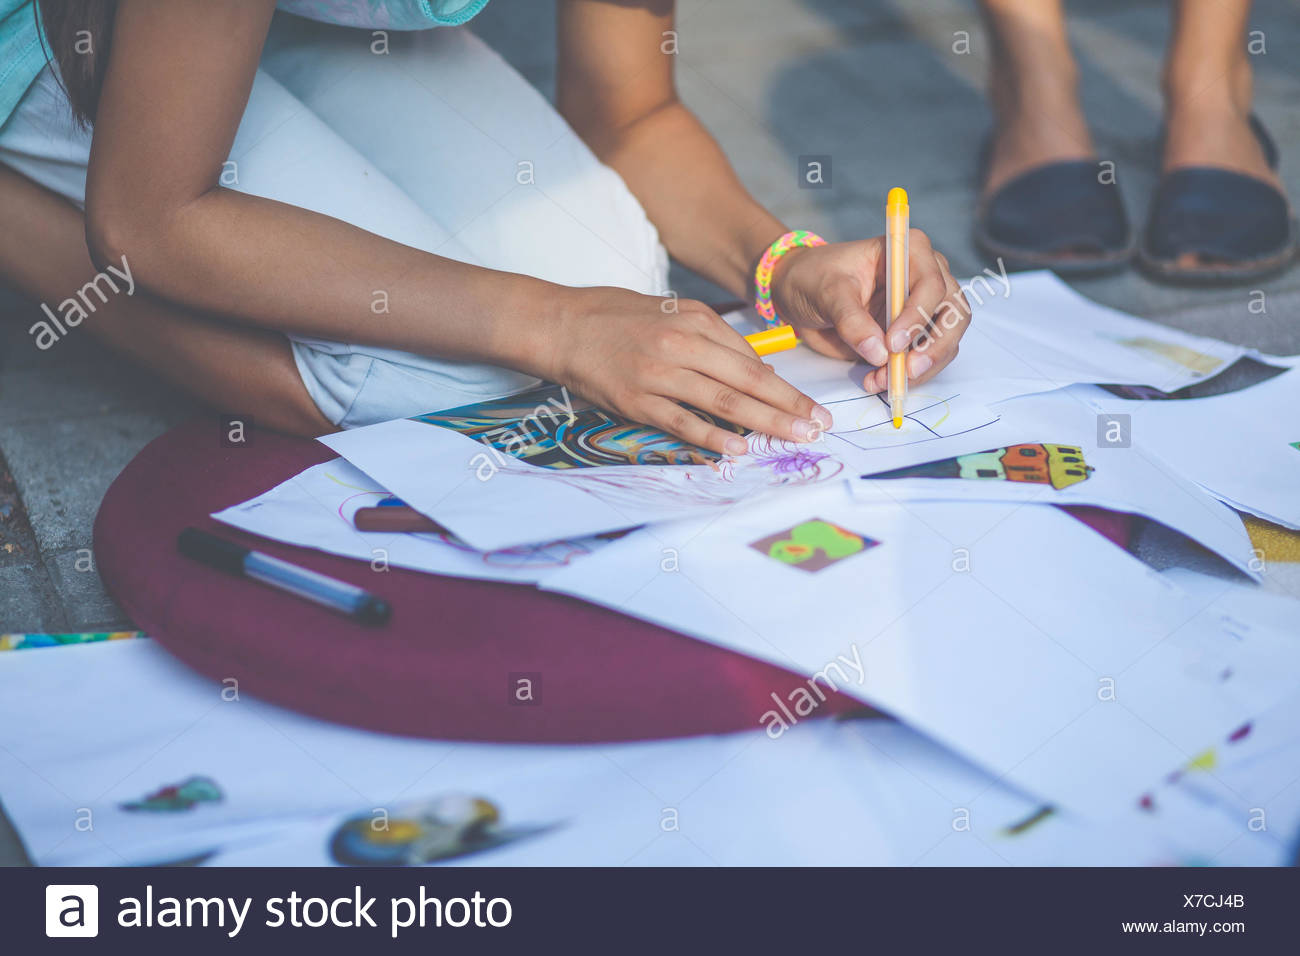 Girl kneeling on ground drawing - Stock Image